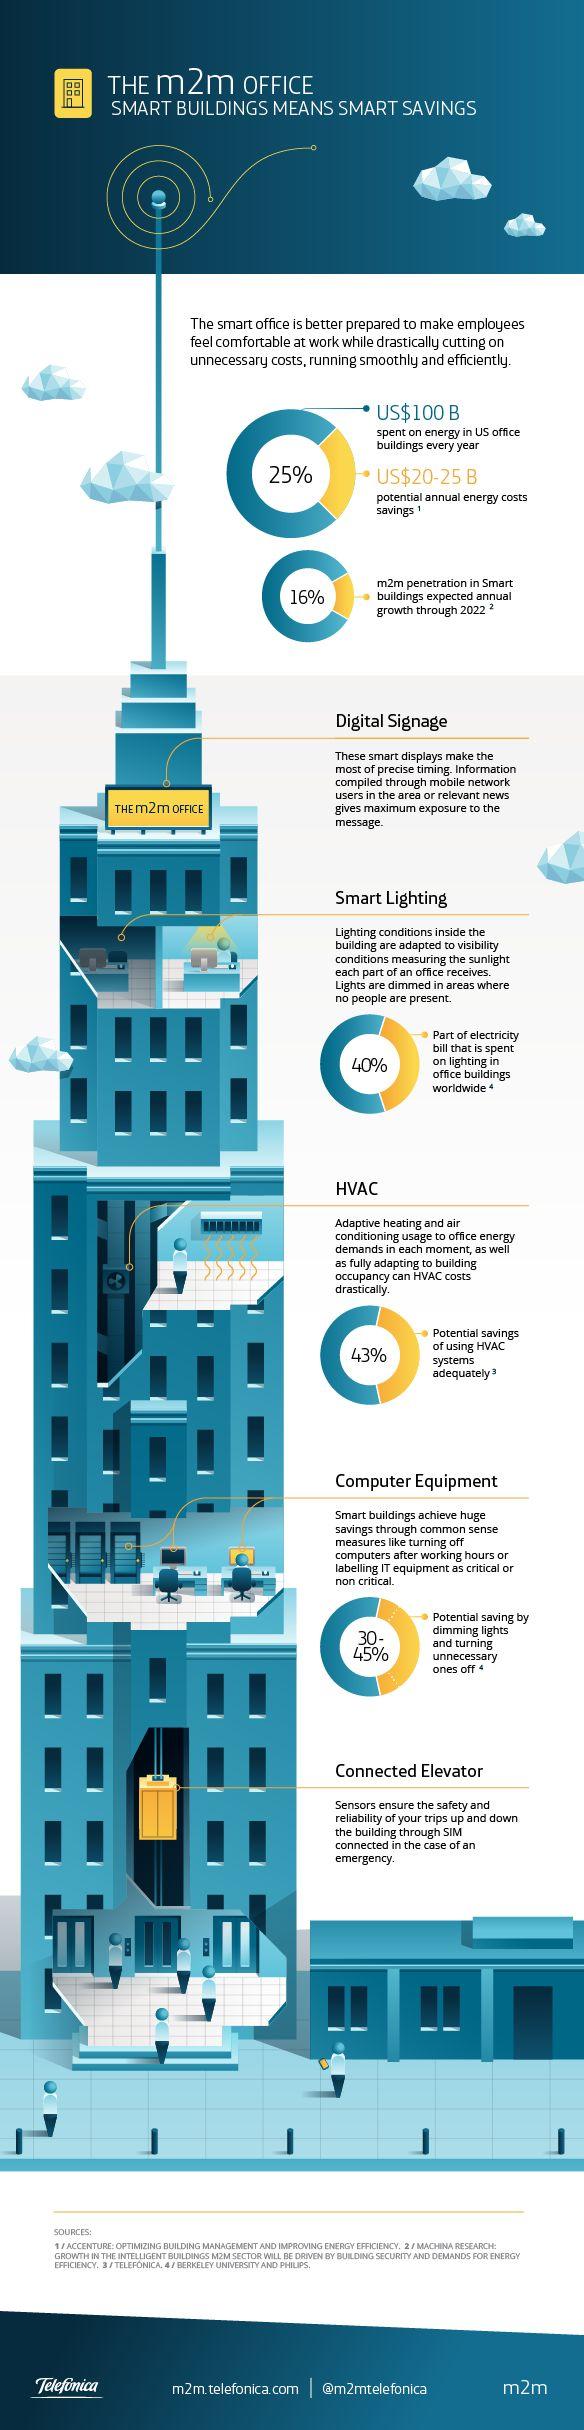 Technology Management Image: 15 Best Images About Smart Buildings